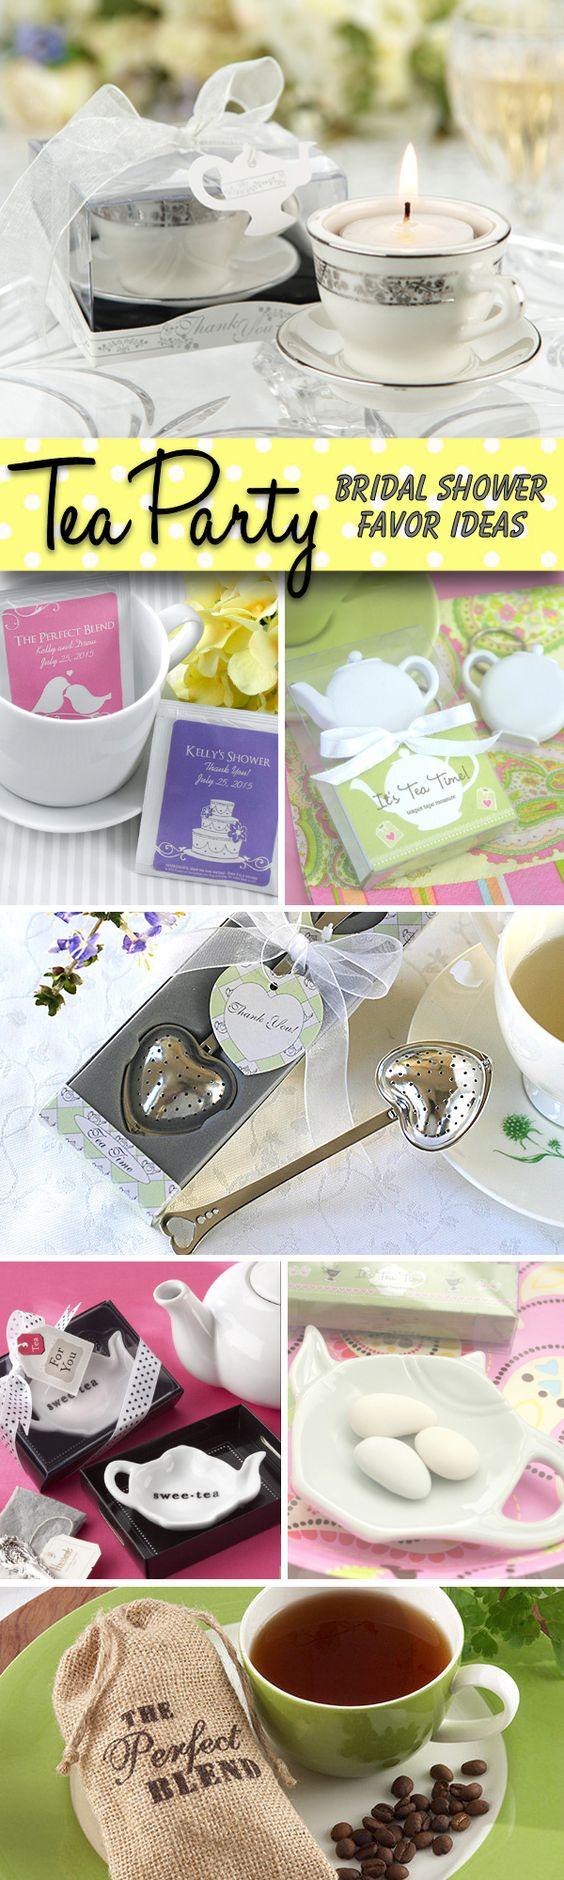 Bridal Favors Ideas Tea Party Favors Bridal Bridal Shower Favors Tea